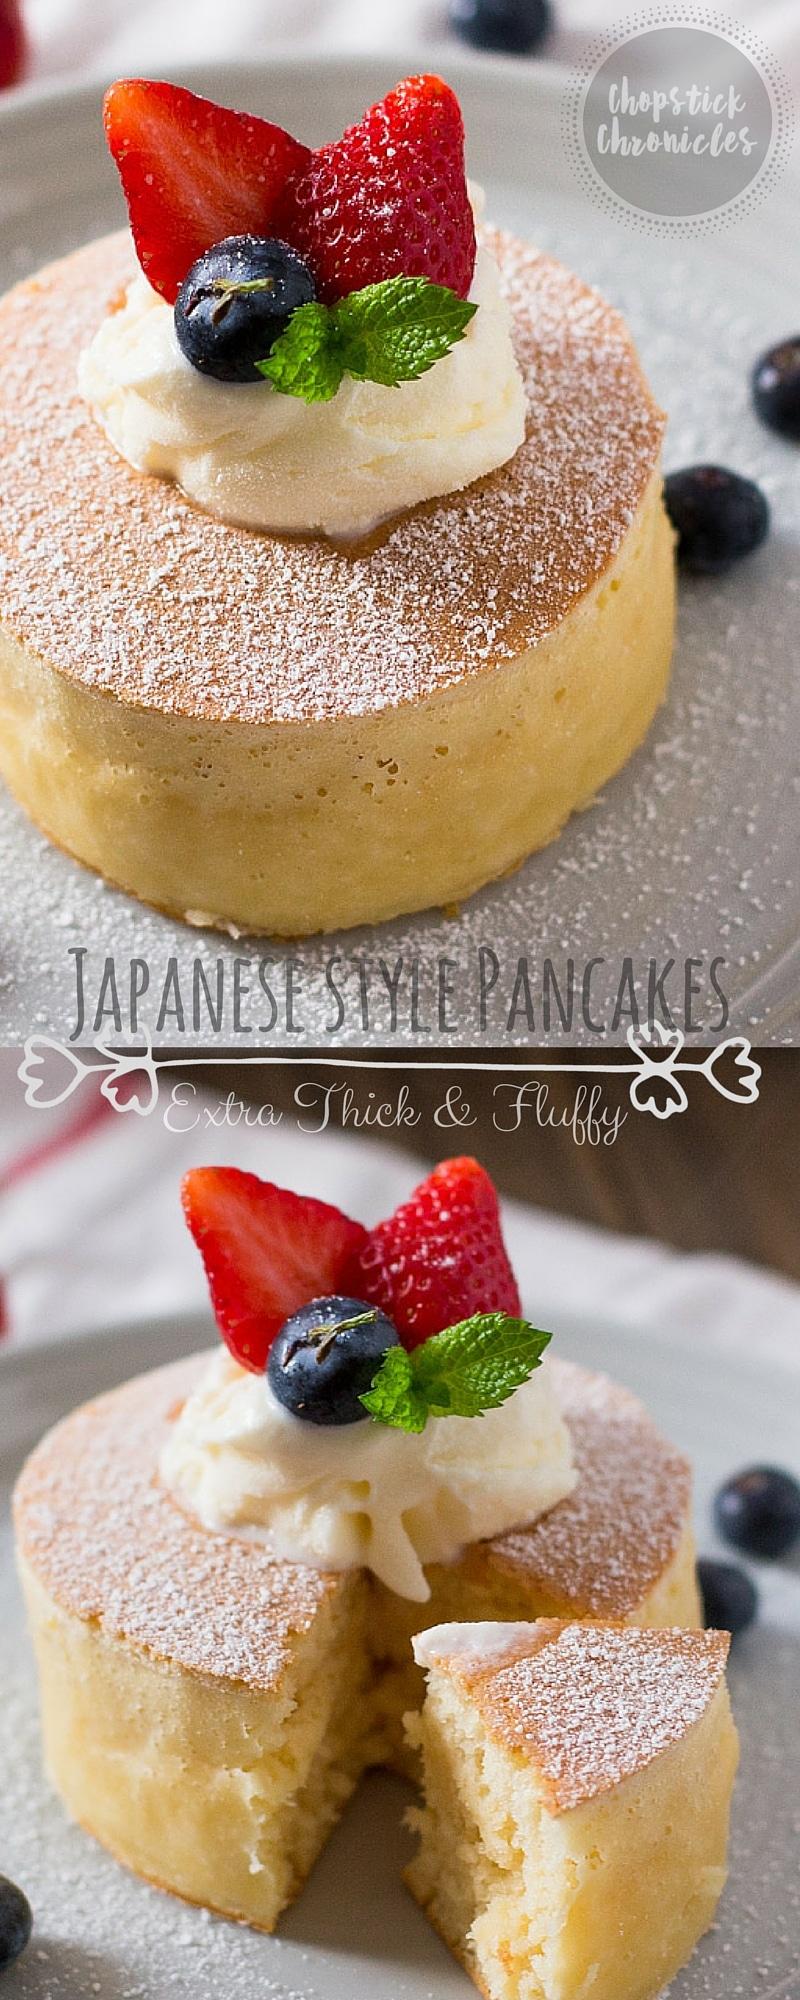 Japanese Style Pancakes